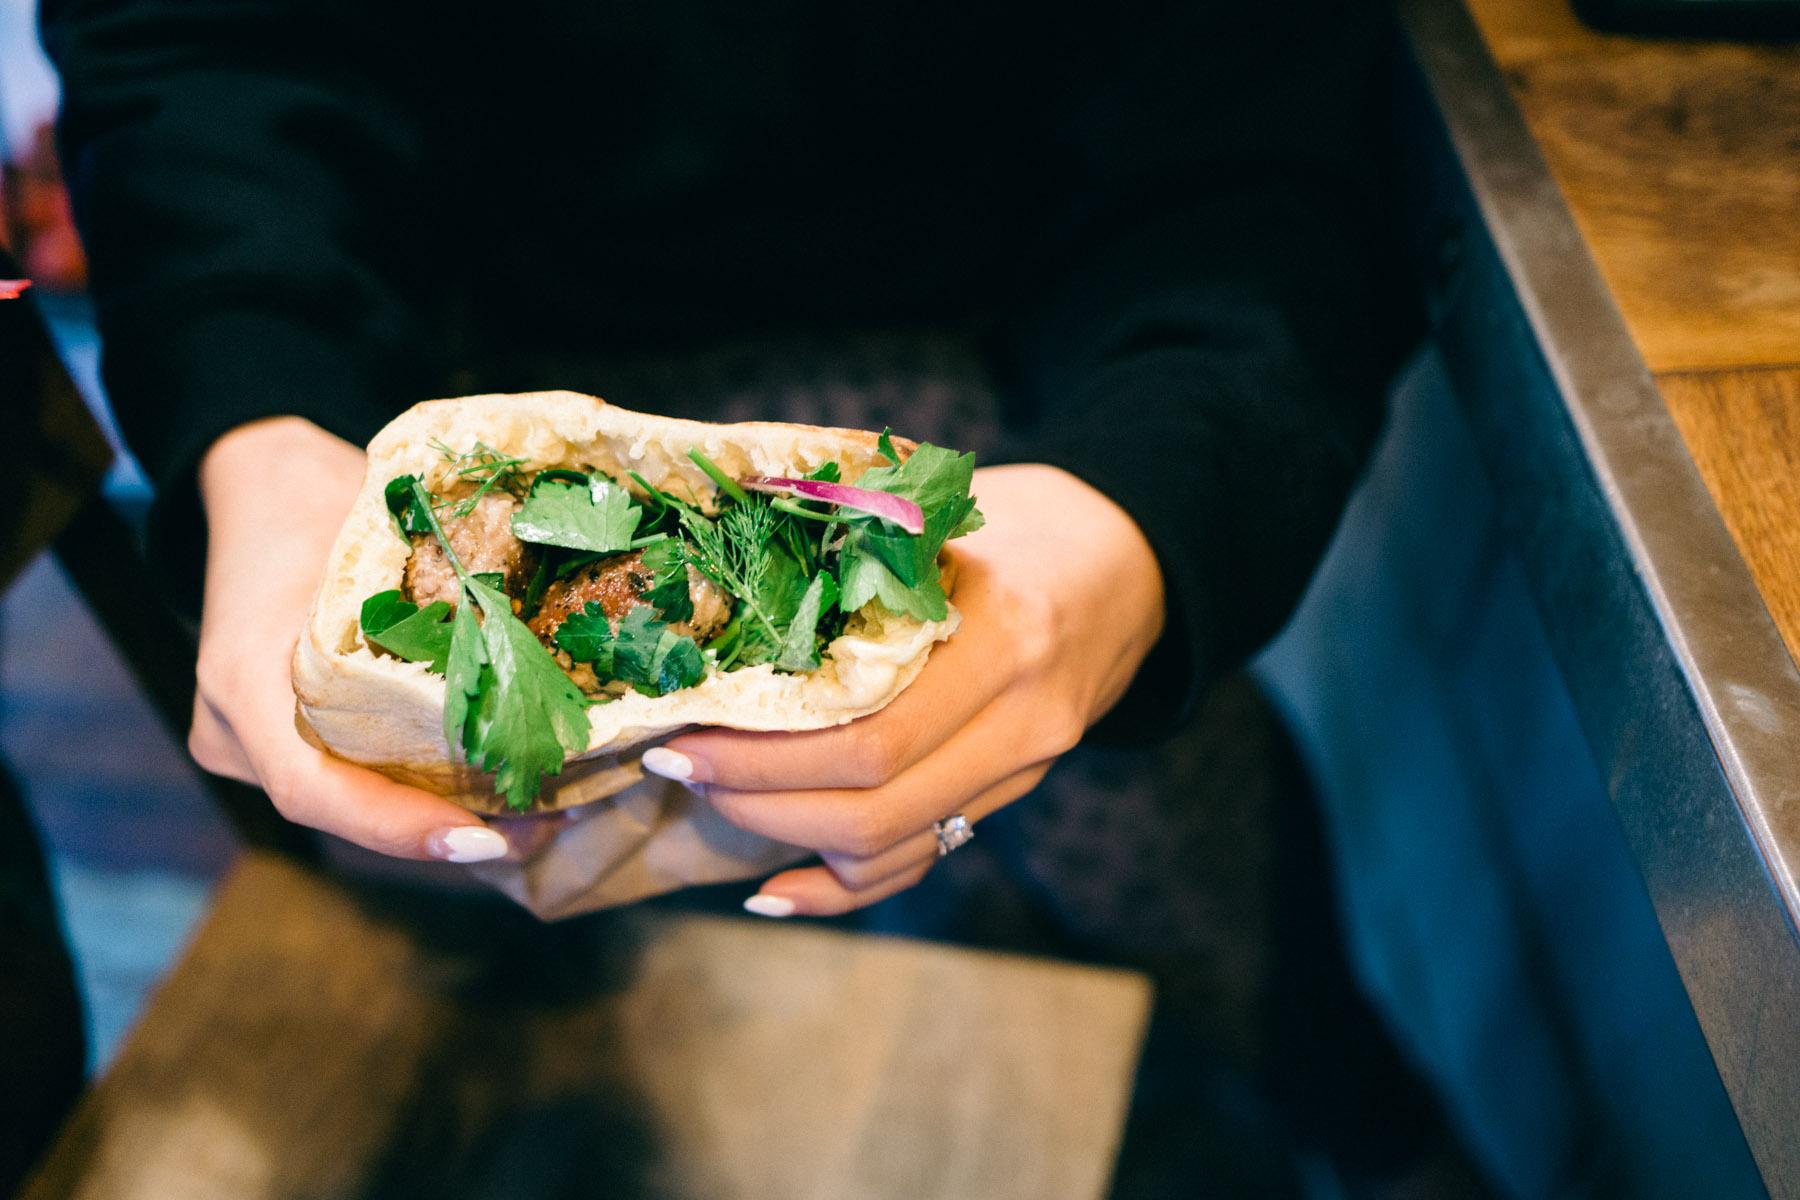 miznon-restaurant-jewish-israeli-parisian-pita-kebabs-paris-france-6